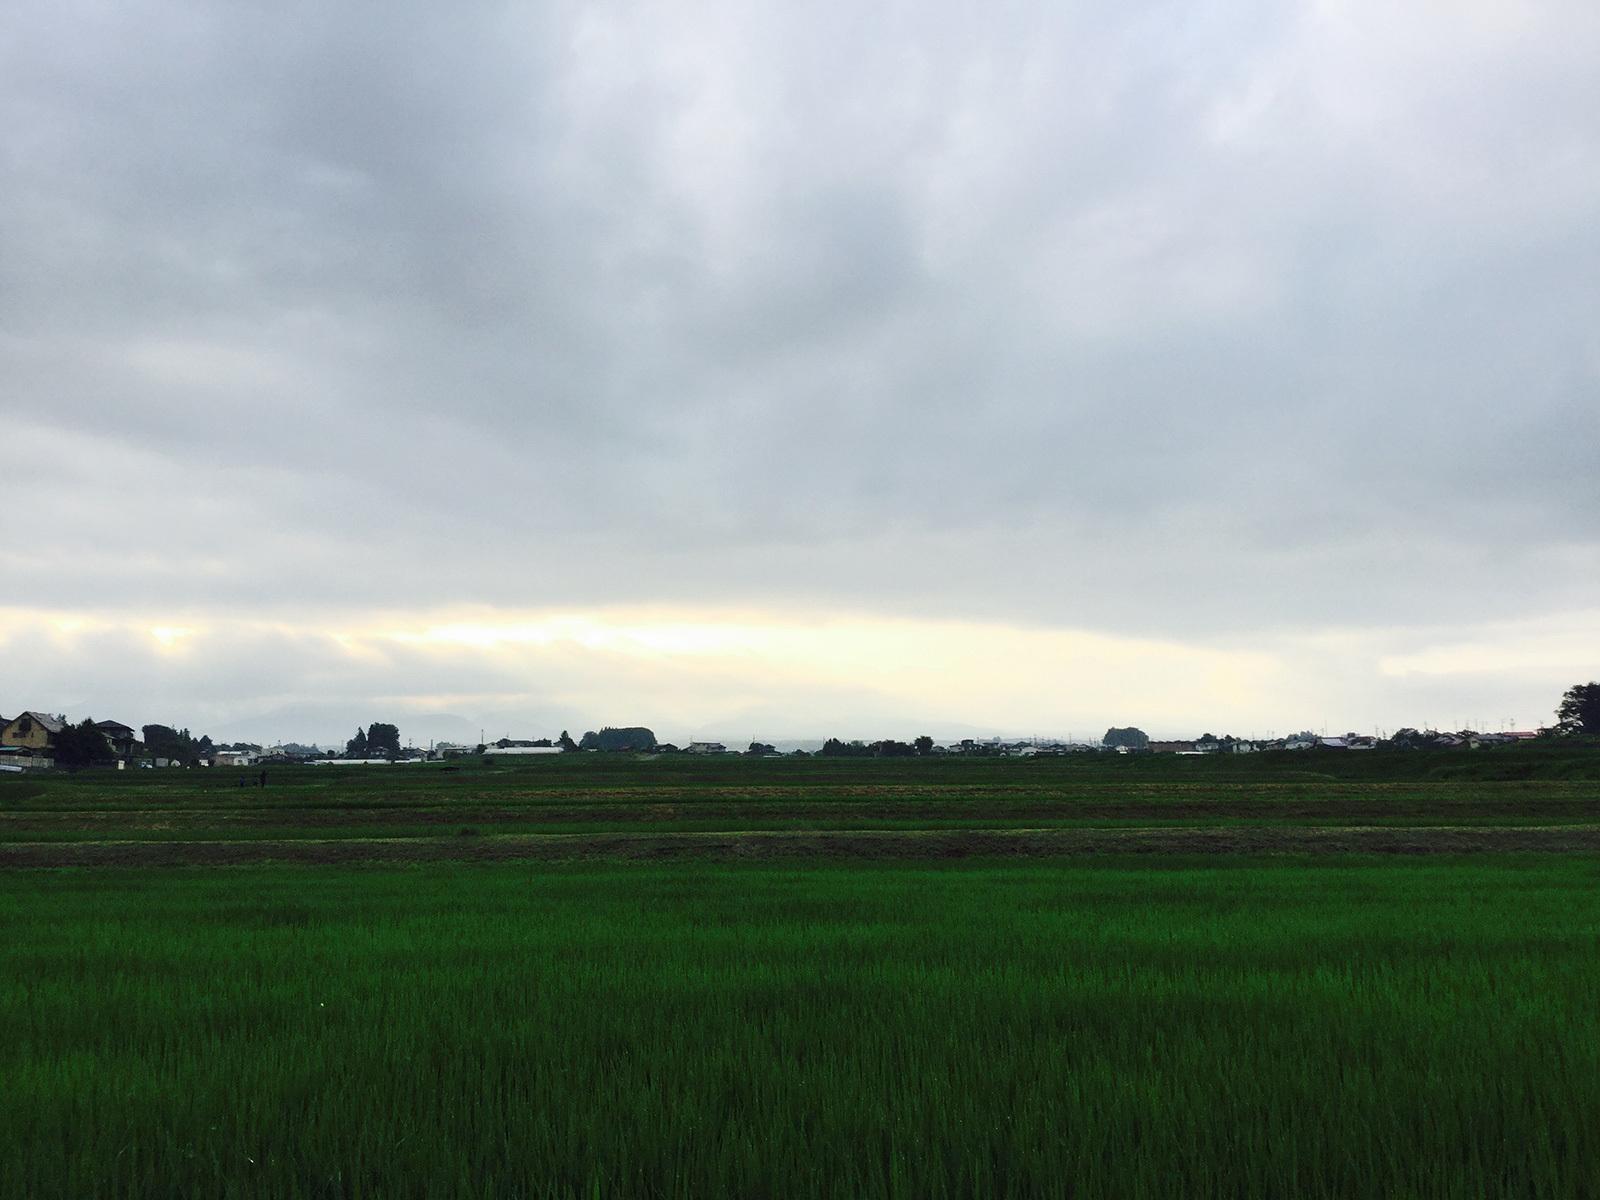 20170720_yatsugatake_1s.jpg